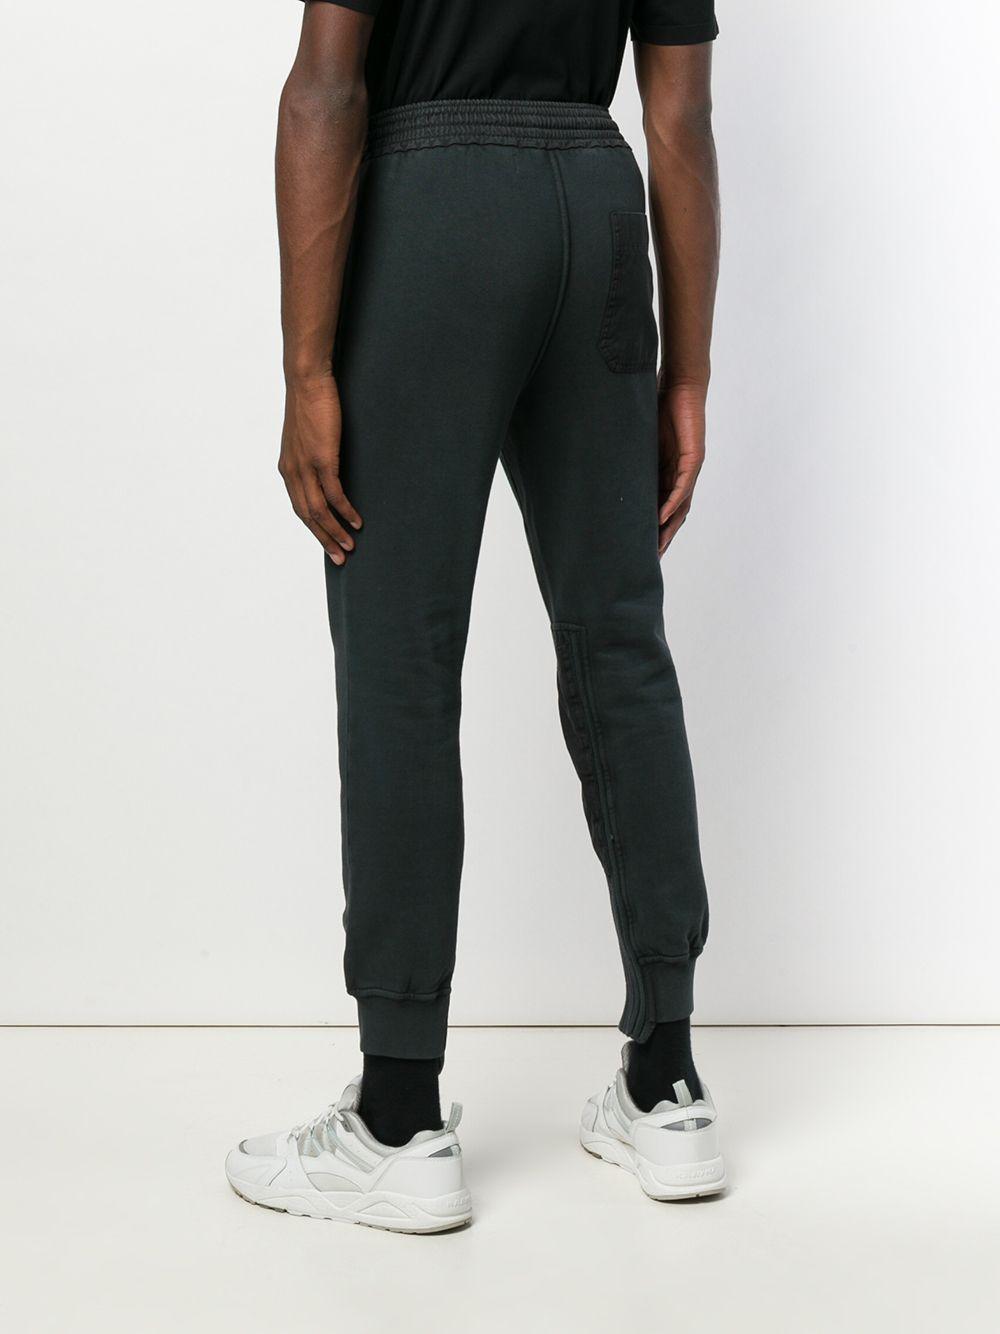 Damir Doma | спортивные брюки со шнурком на талии | Clouty